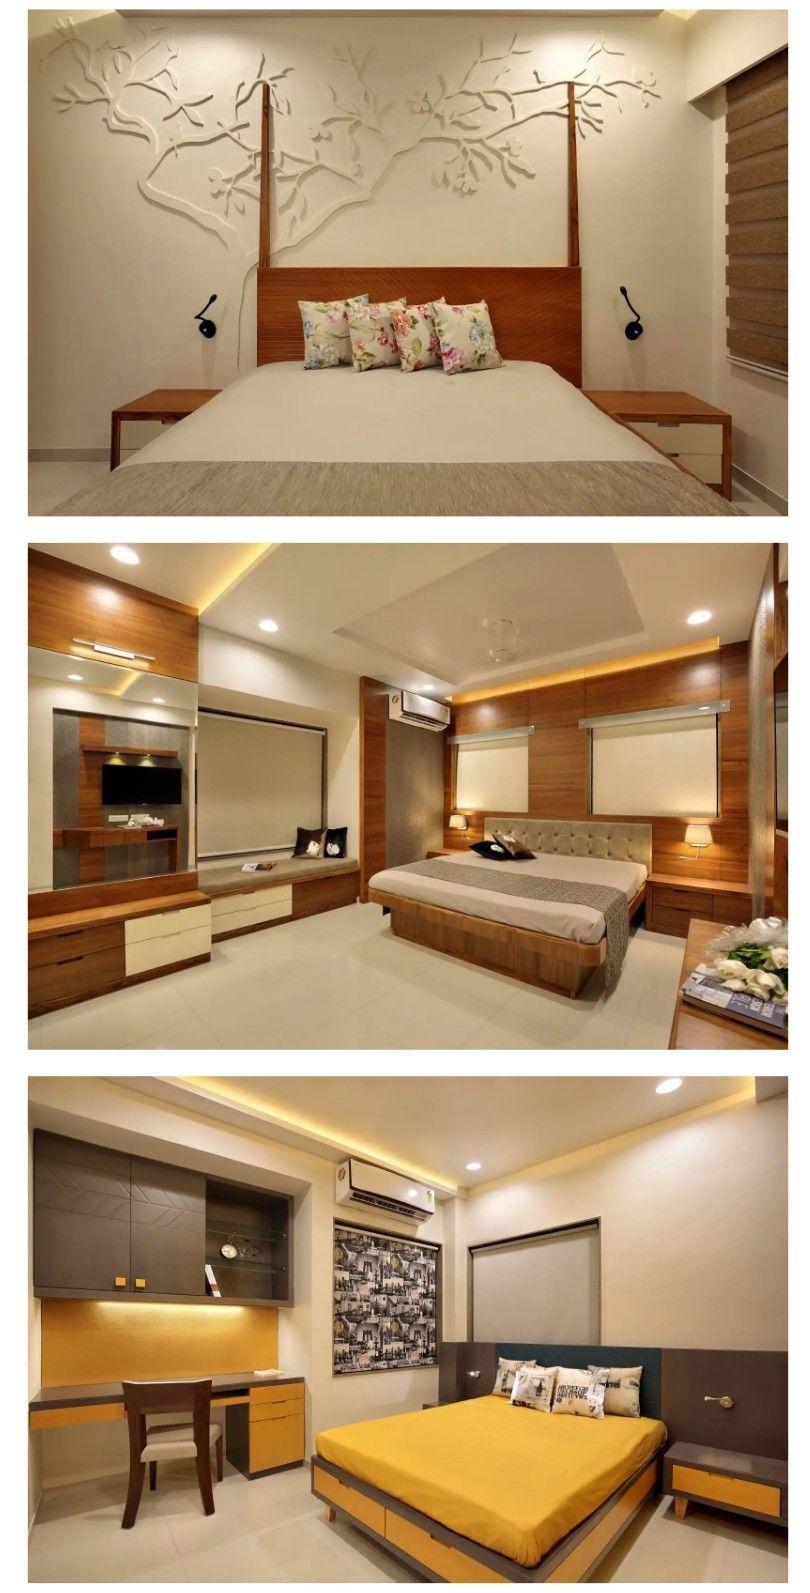 Modern bedroom interior design ideas apartment luxurious bedrooms luxury also interiors studio in rh pinterest